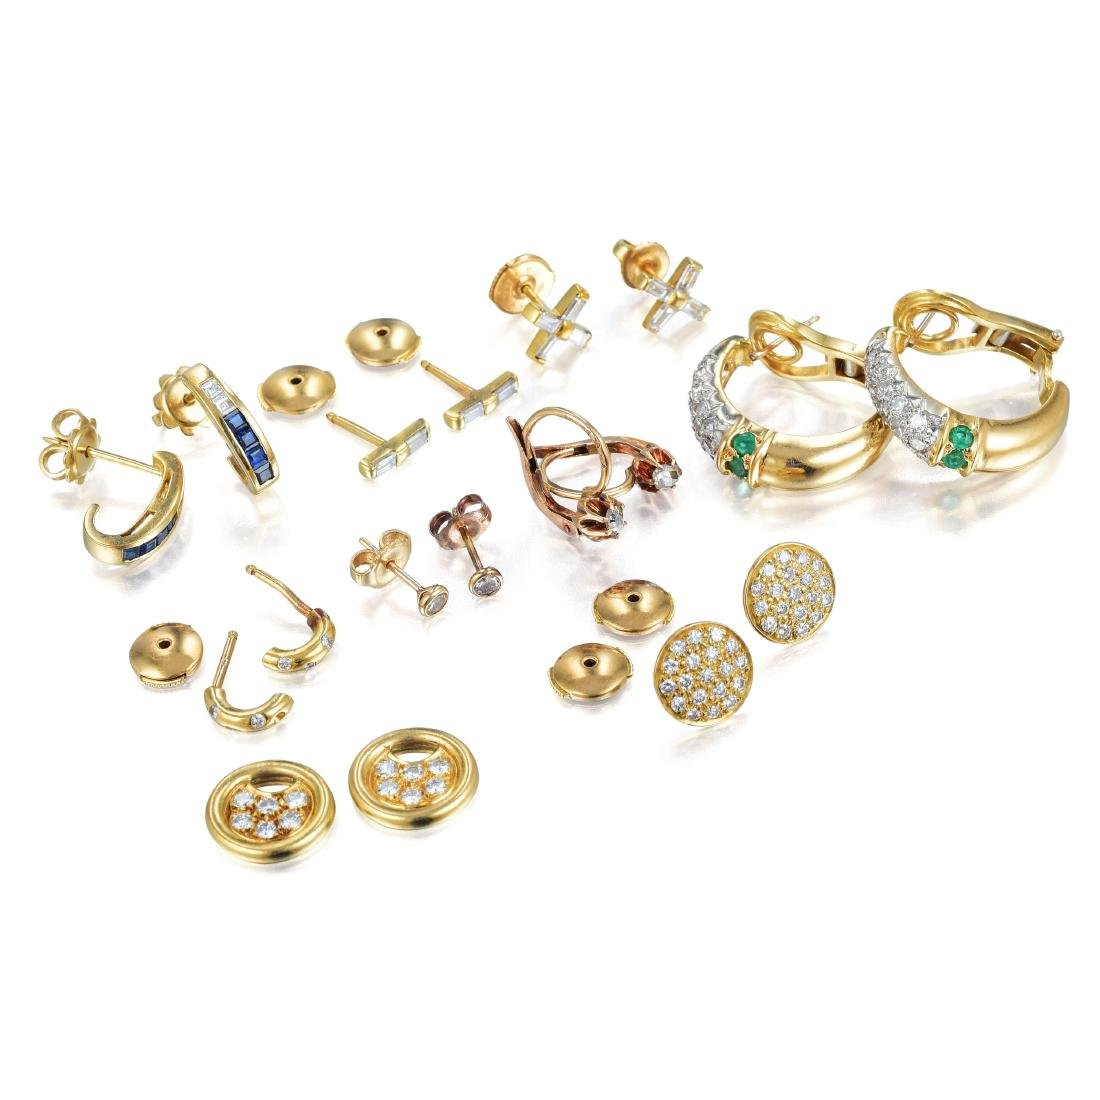 A Lot of Nine Pairs of Diamond Earrings